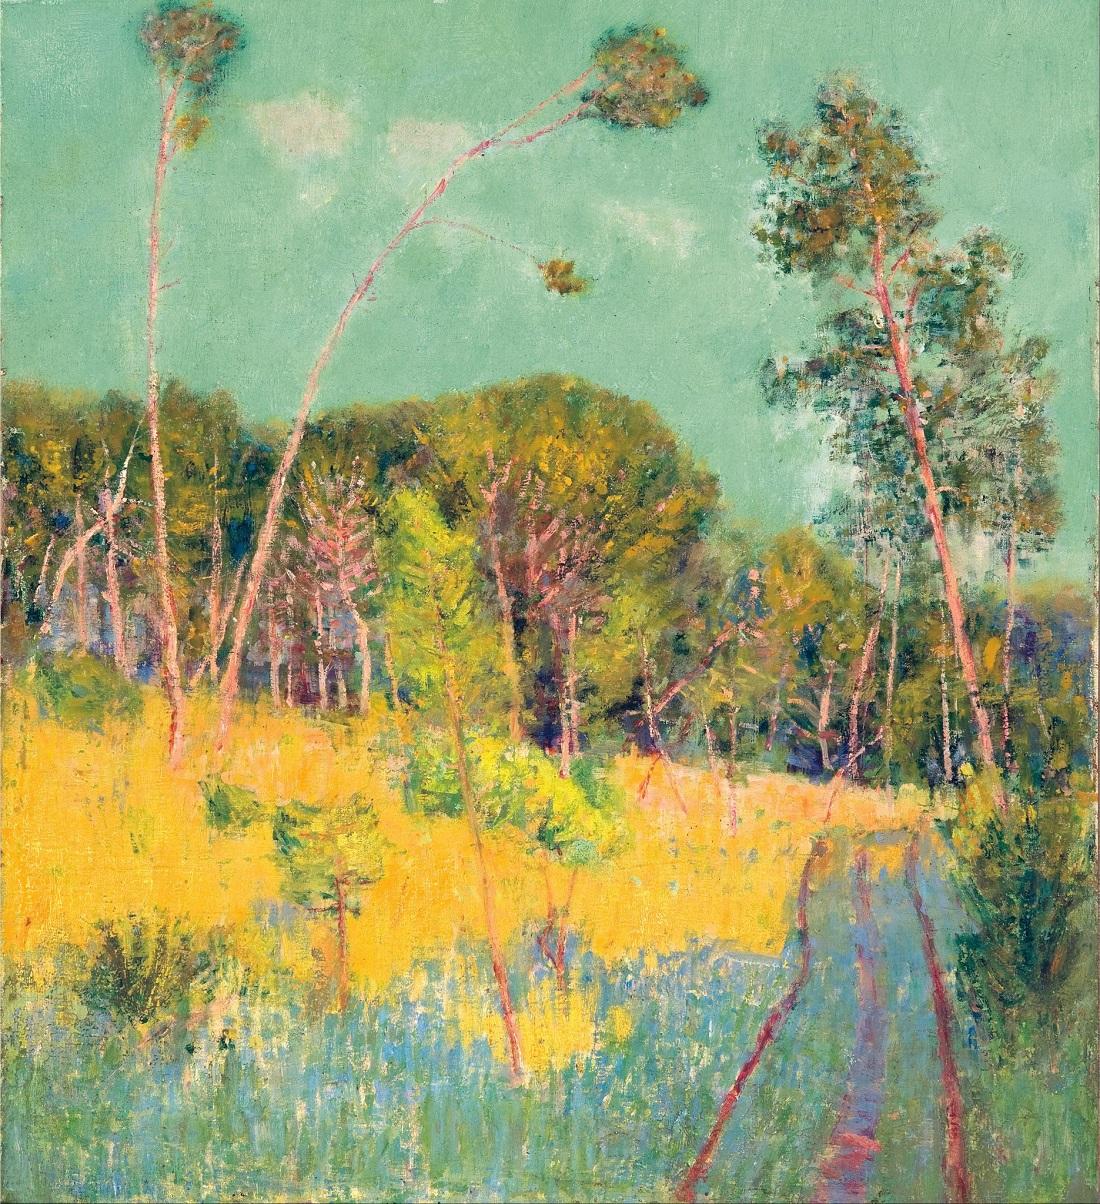 Живопись_Джон-Питер-Рассел_A-Clearing-in-the-Forest-1891.jpg